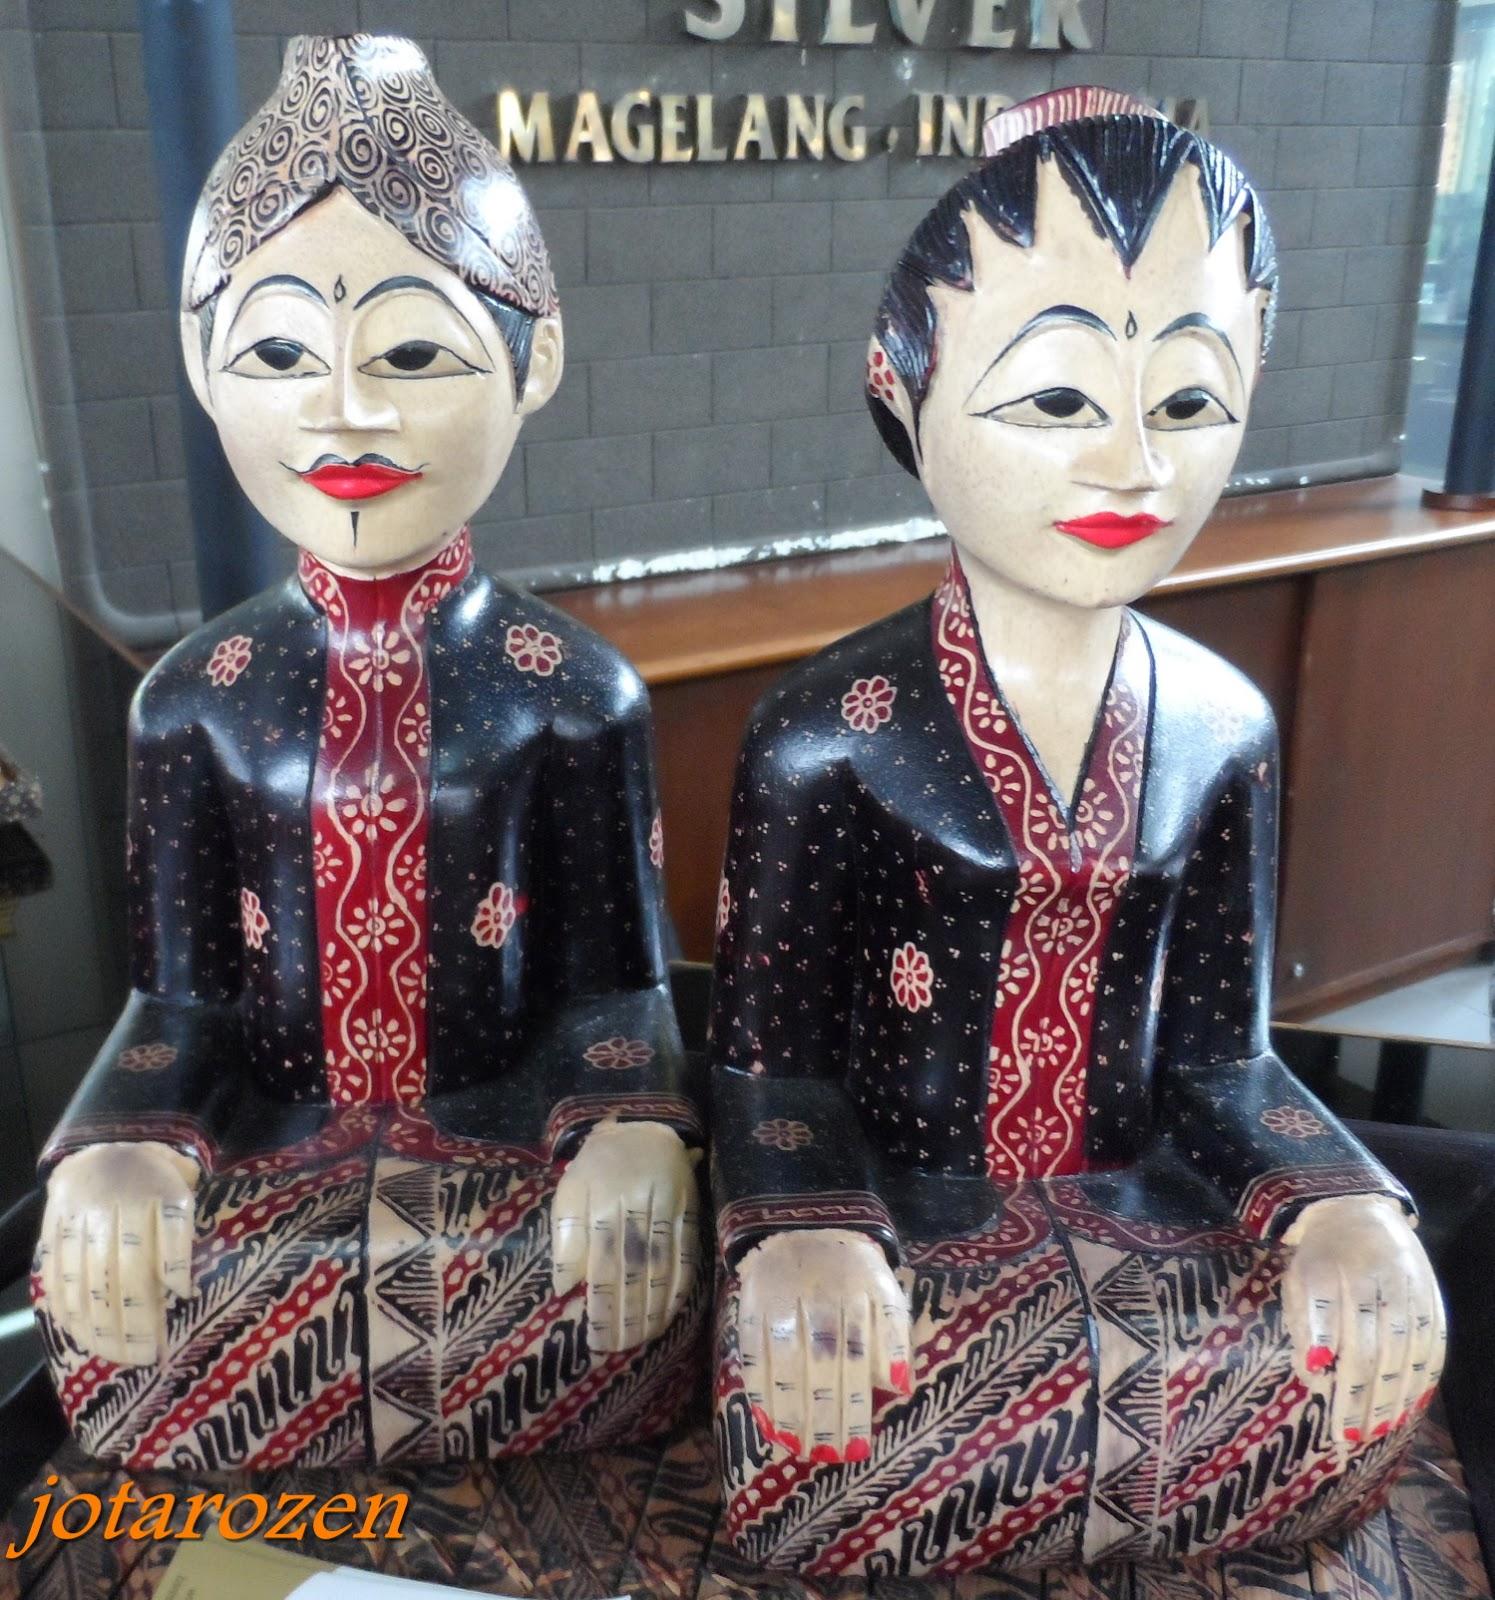 Footsteps - Jotaro's Travels: Jogjakarta Indonesia 2013 - Borobudur ...